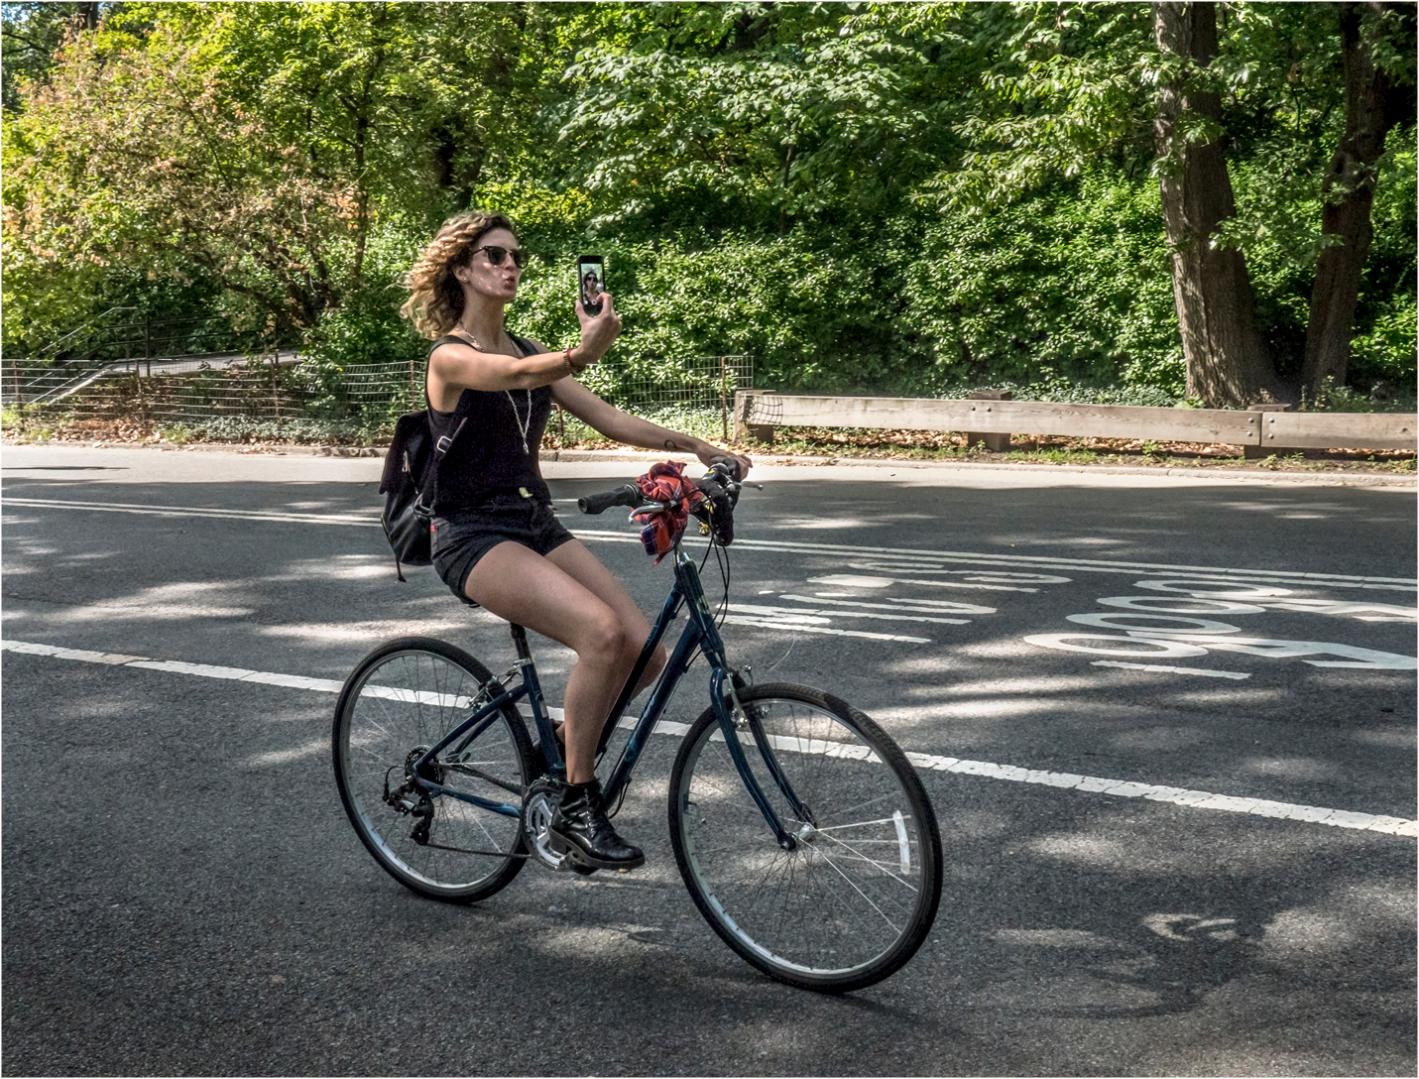 **Selfie-Bike-Rider copy